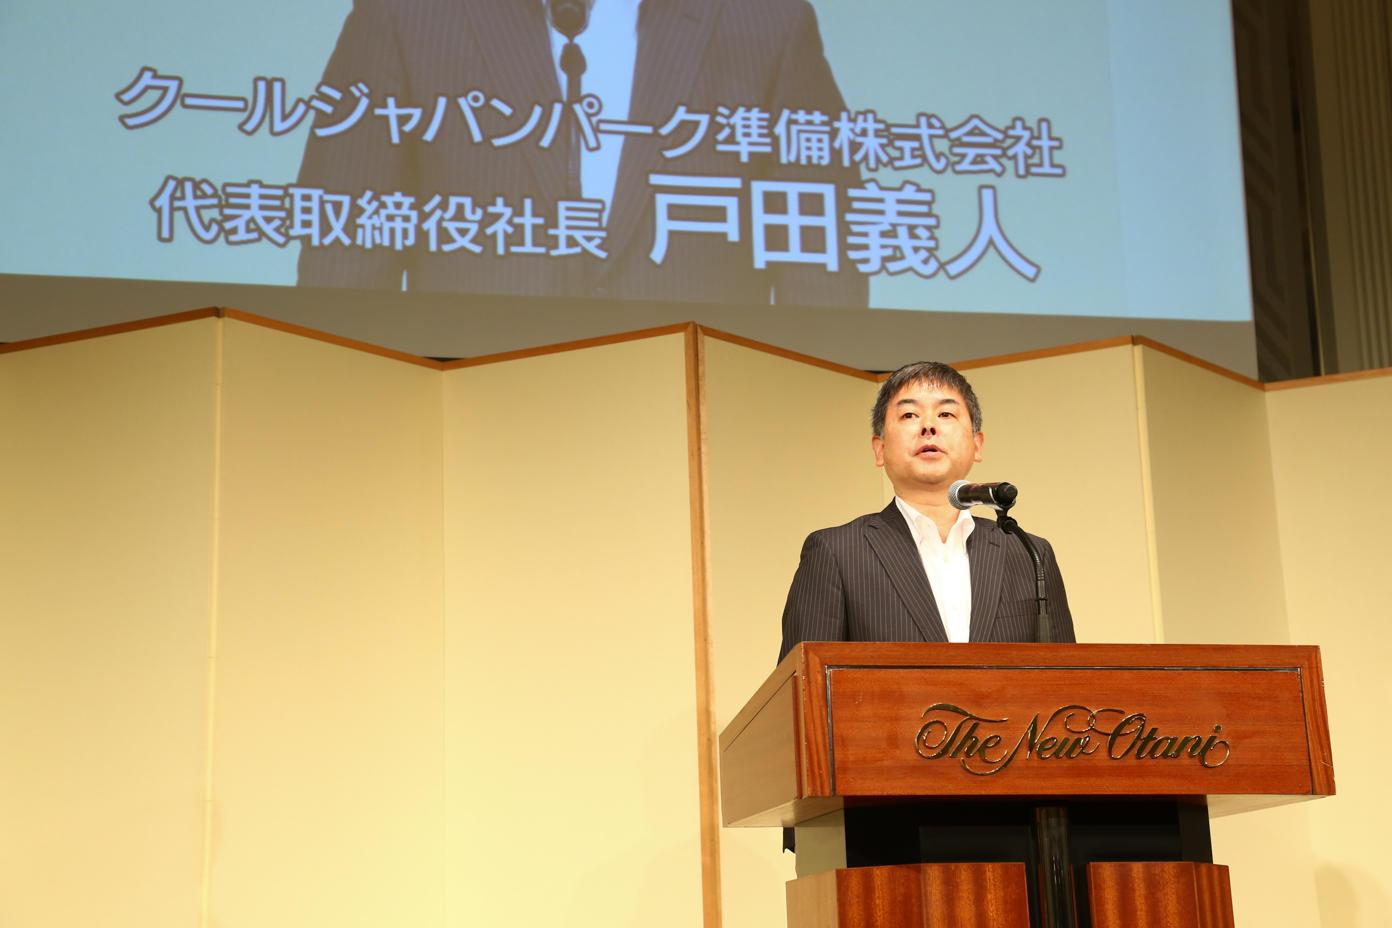 http://news.yoshimoto.co.jp/20180705192522-86b8e9d773581123be40a5e8bb8868f5e7a725c8.jpg